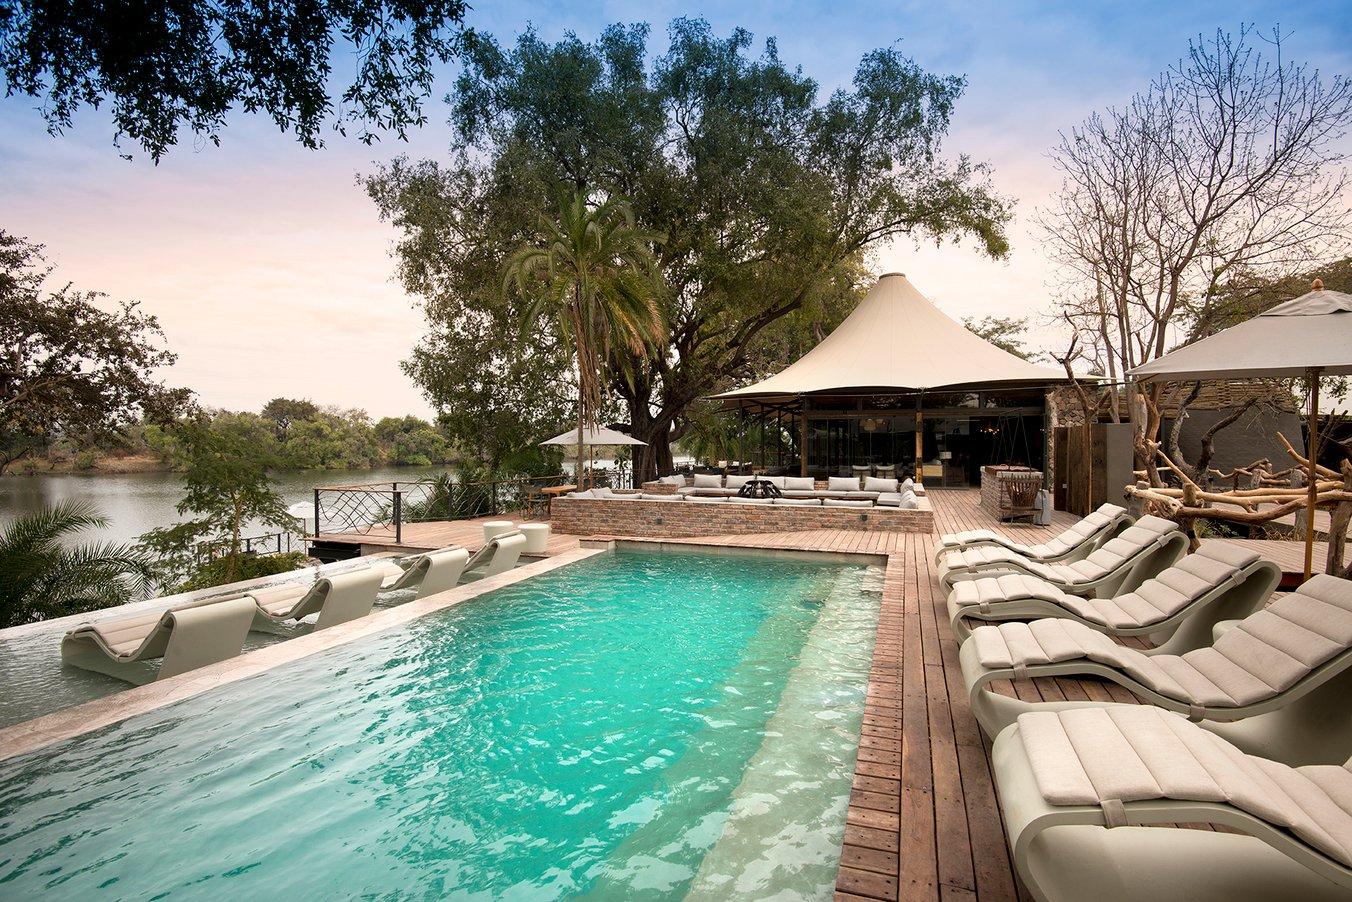 Thorntree River Lodge Livingstone Zambia African Bush Camps Luxury Safari Lodge (100) Pool Area